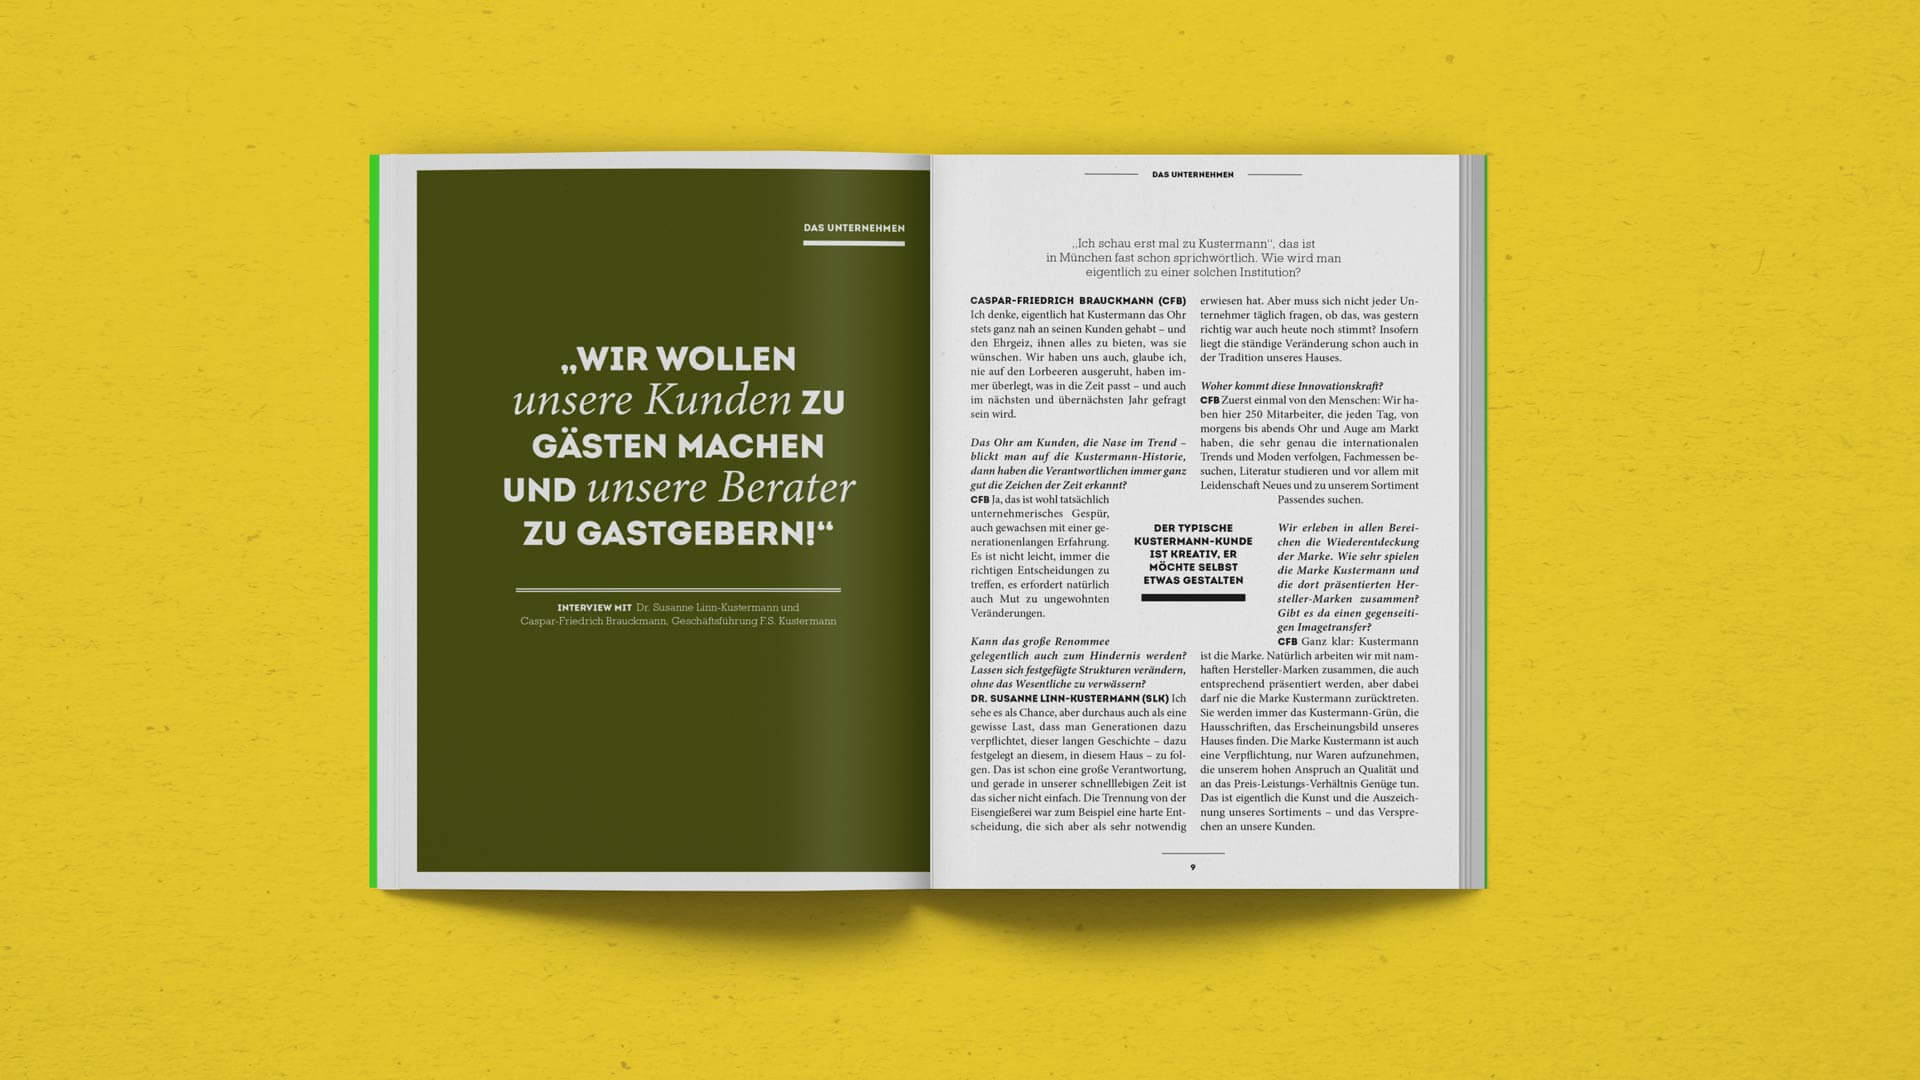 Interview Spread in the Kustermann Brochure